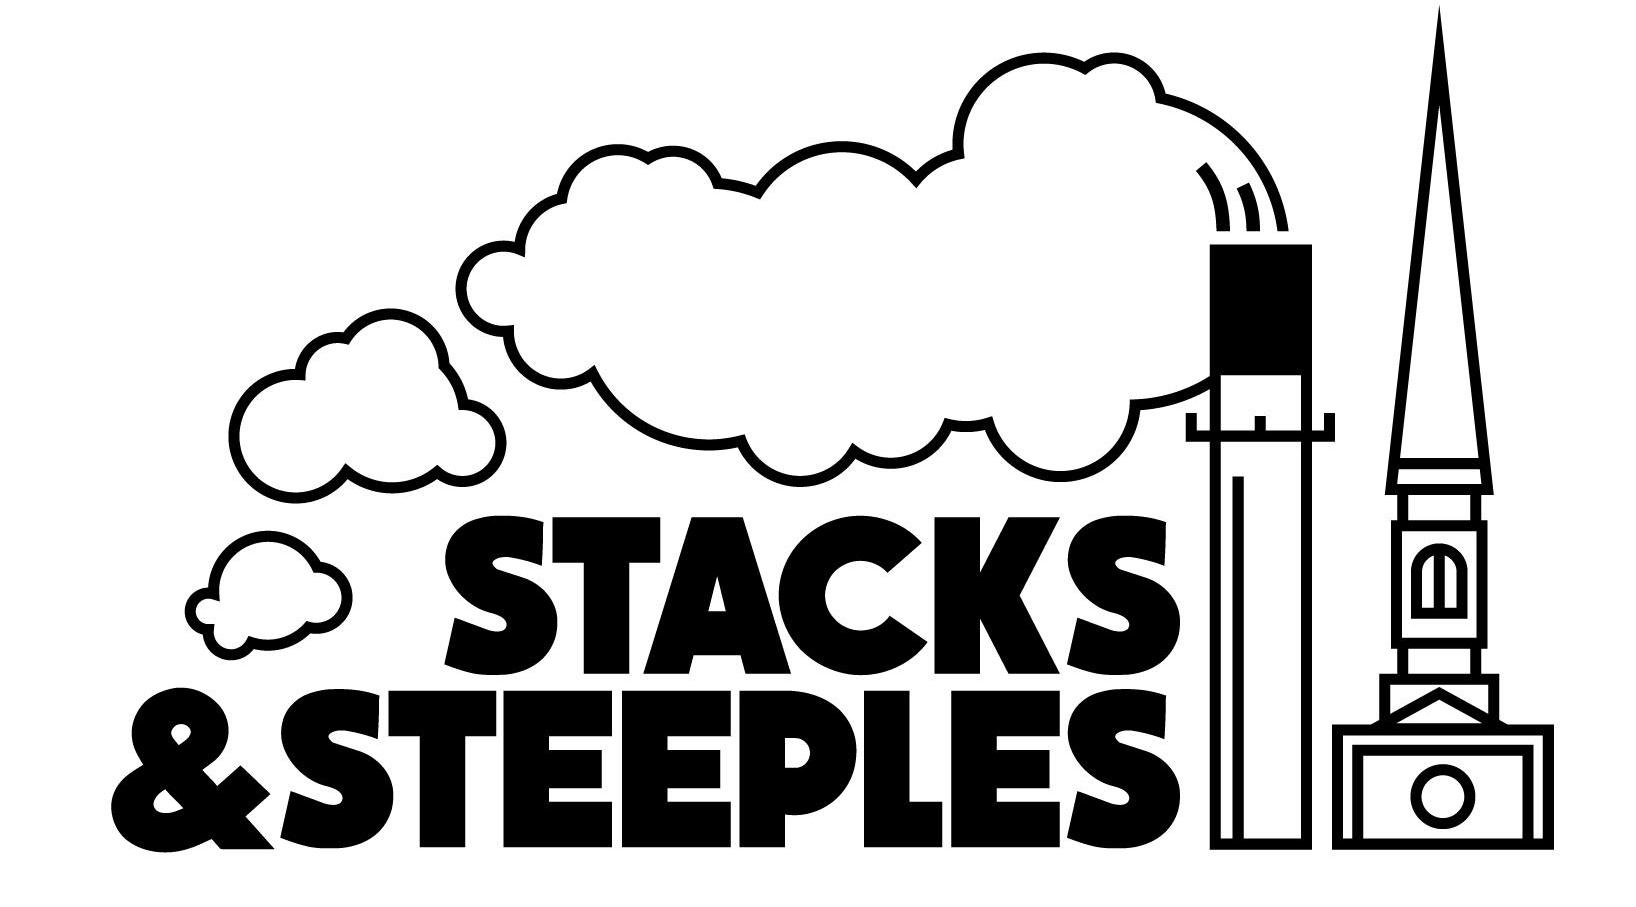 Stacks_Steeples_Logo.jpg